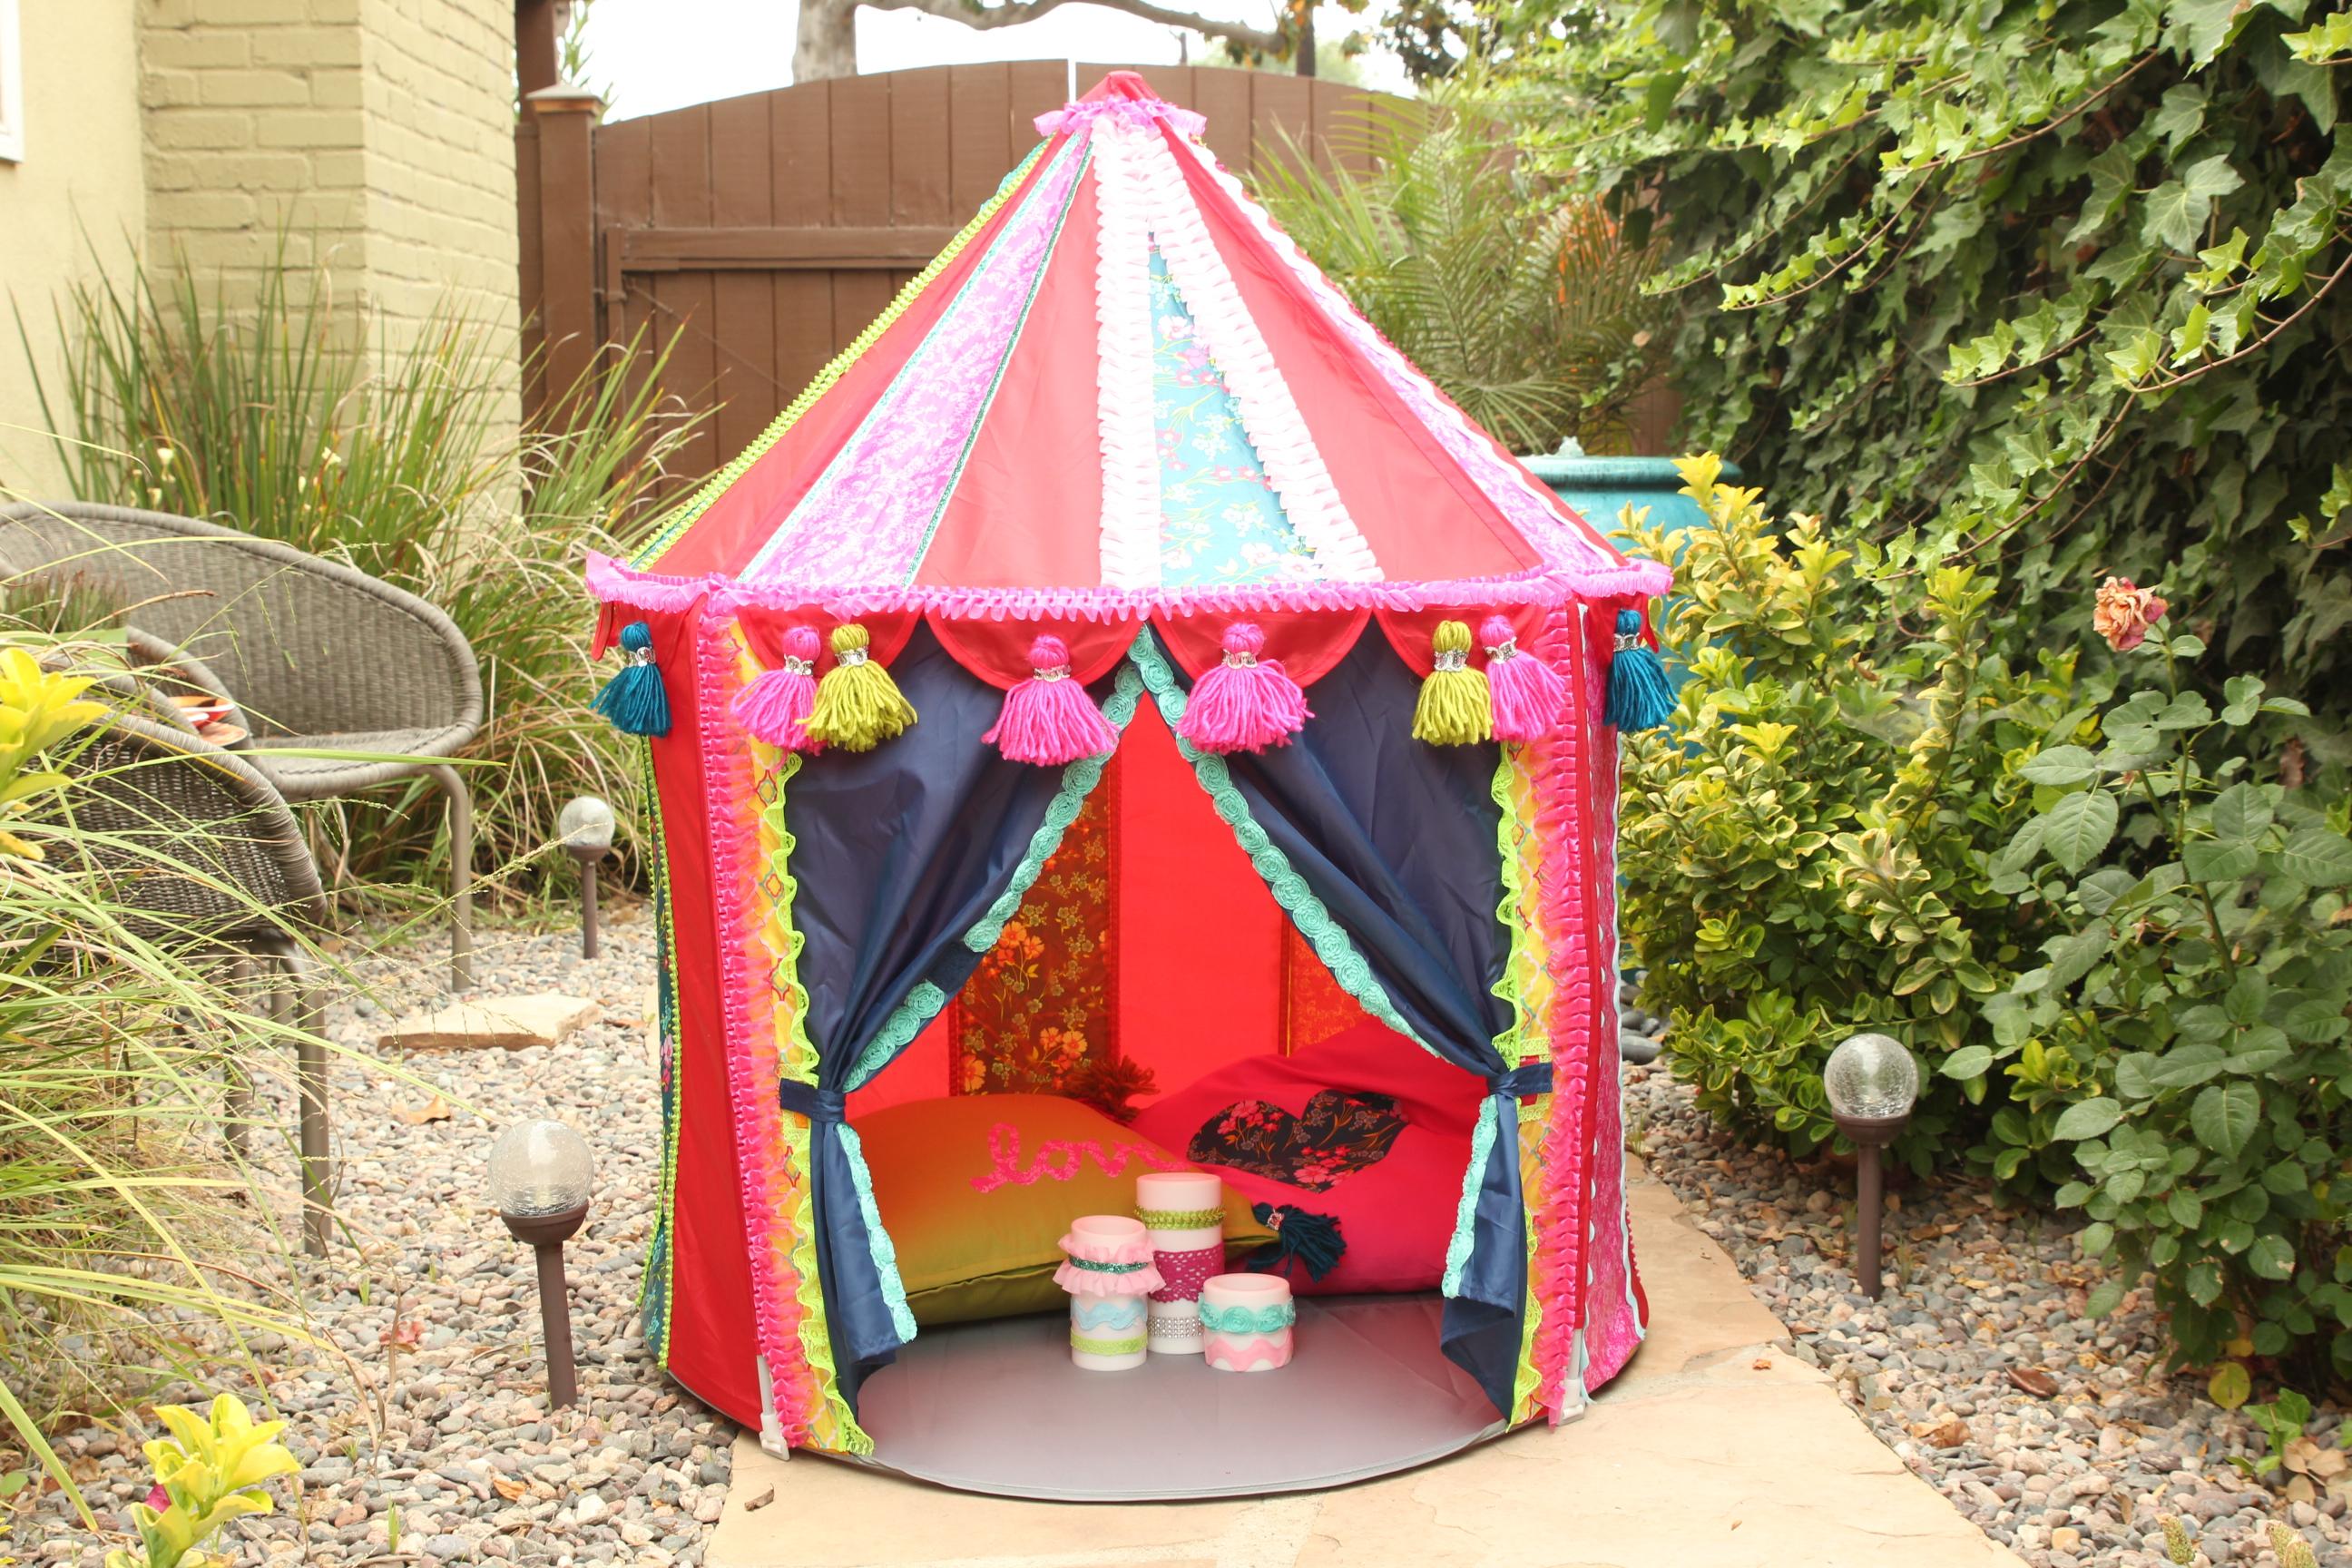 Ikea Hack! Make a Boho Play Tent from the CIRKUSTLT Tent